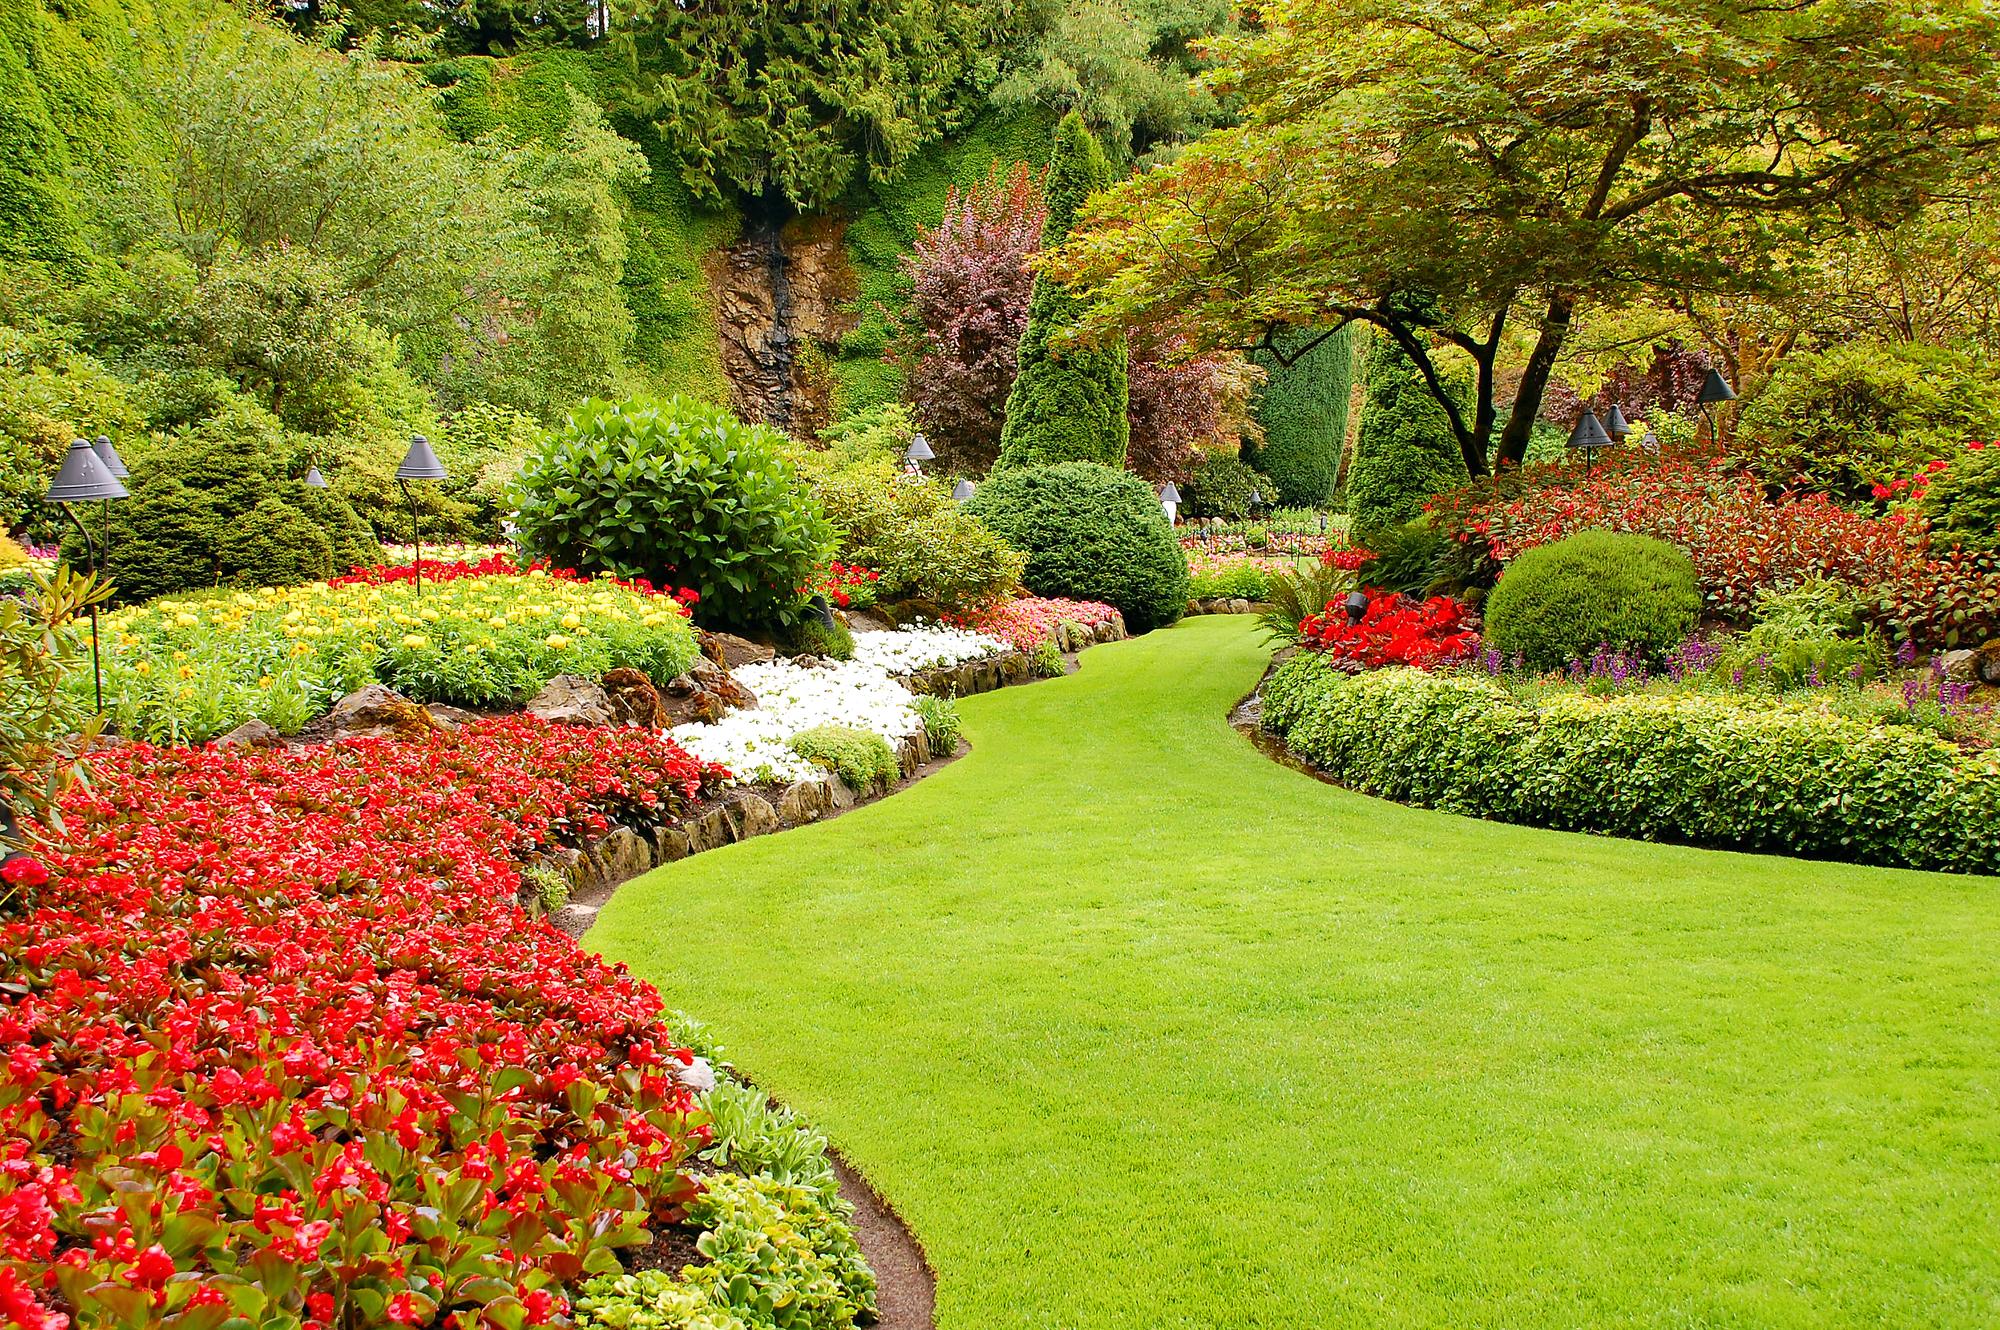 lawn-garden 100+ Surprising Garden Design Ideas You Should Not Miss in 2021